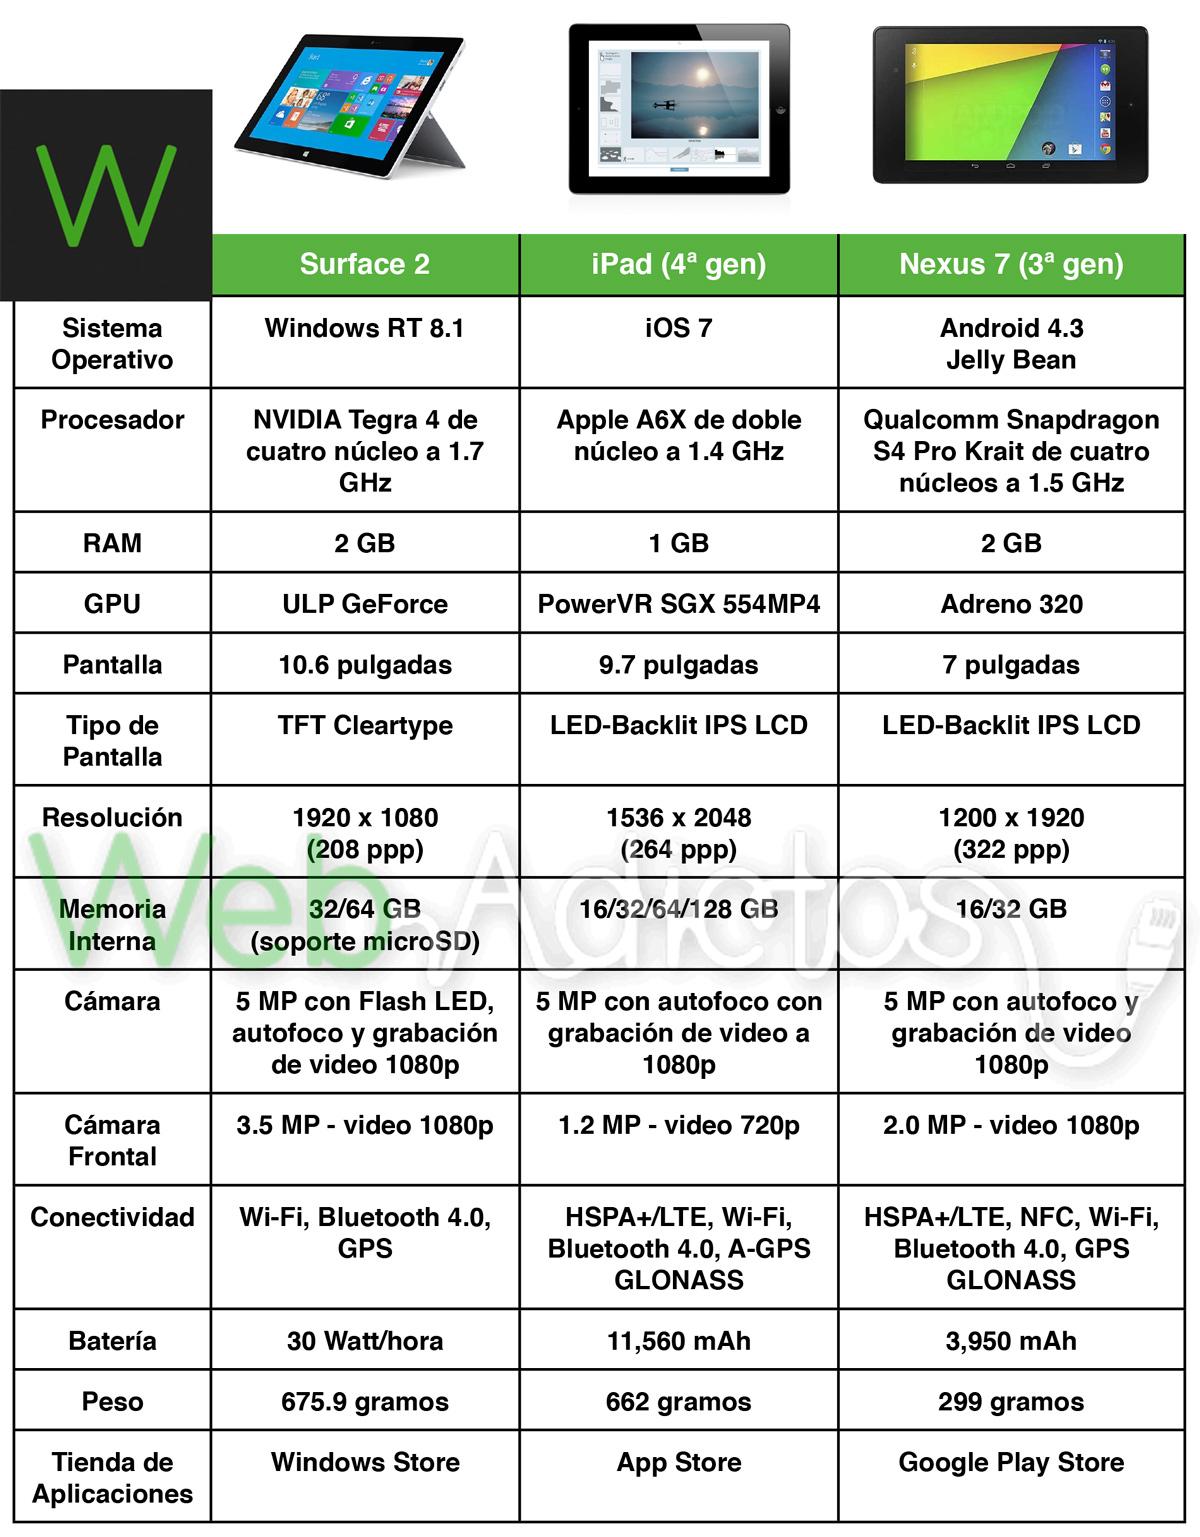 Comparativa: Surface 2 Vs iPad (4ª gen) Vs Nexus 7 (2ª gen) - Comparativa-Surface-2-ipad-nexus-7